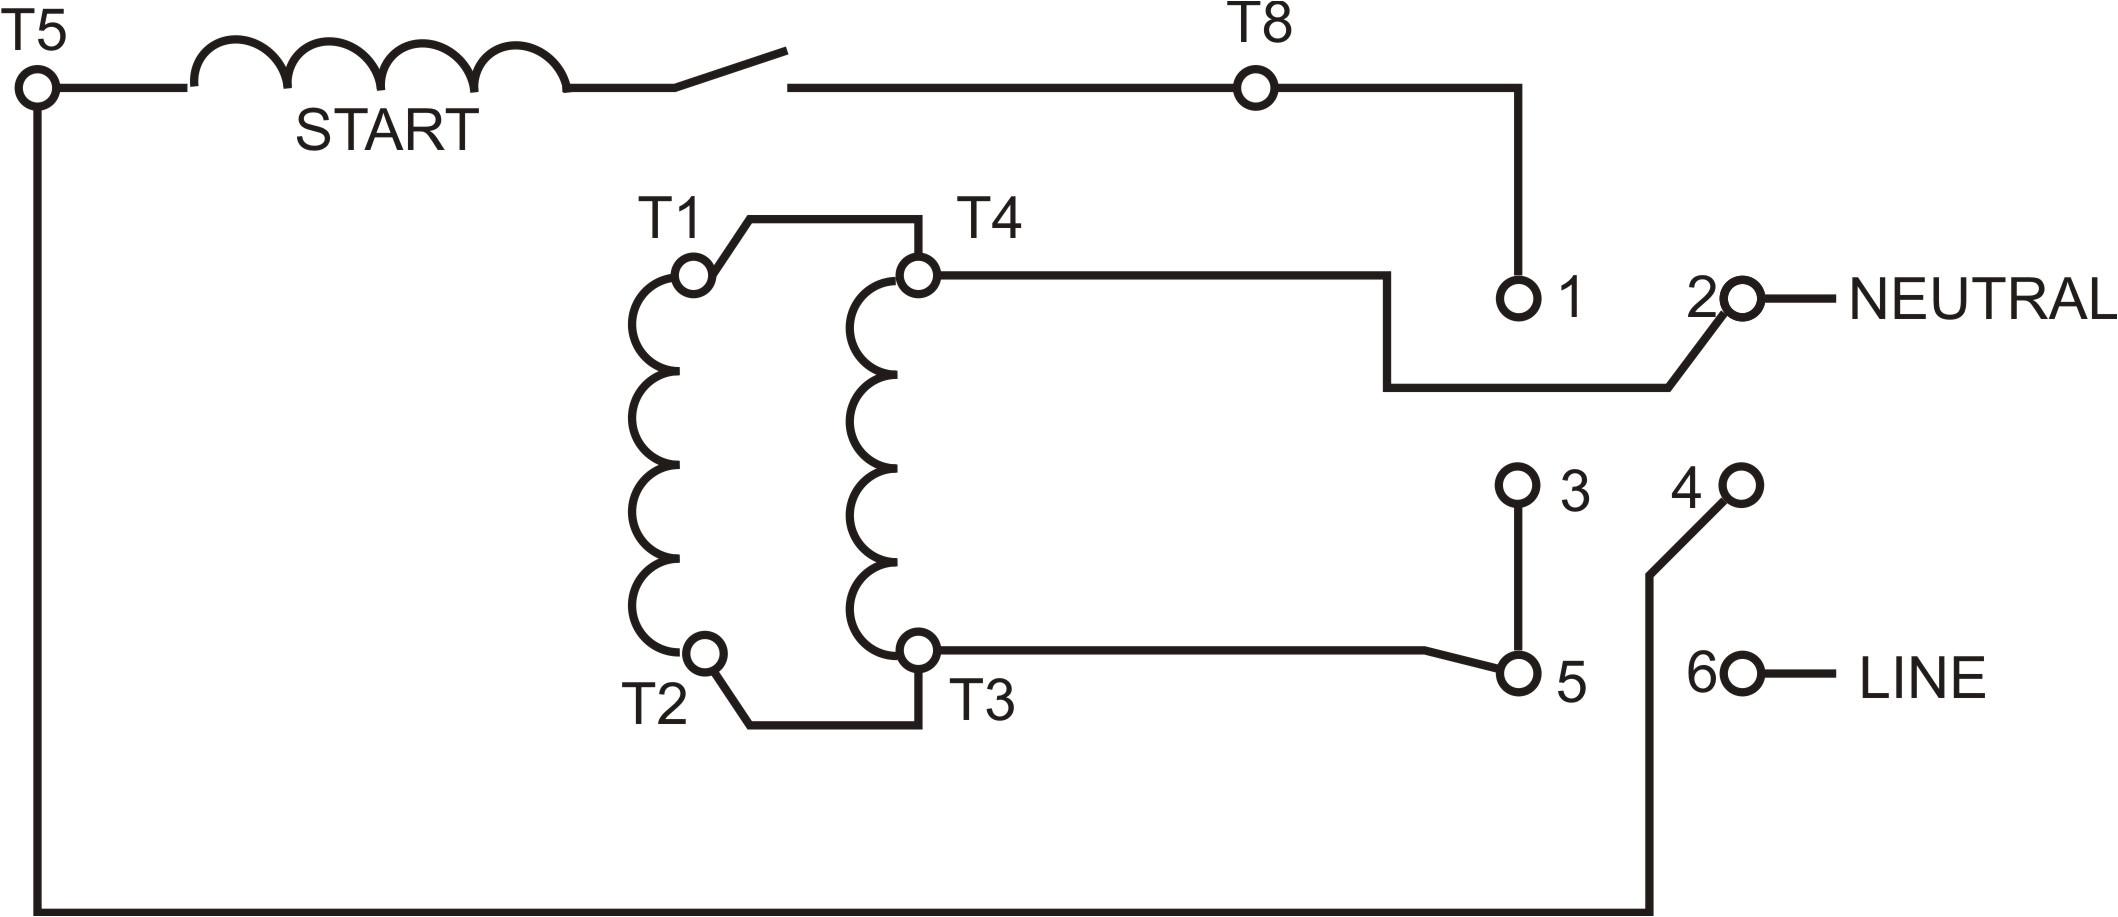 220 Volt Single Phase Motor Wiring Diagram Reversible Electric Motor Wiring Diagram Wiring Diagram Technic